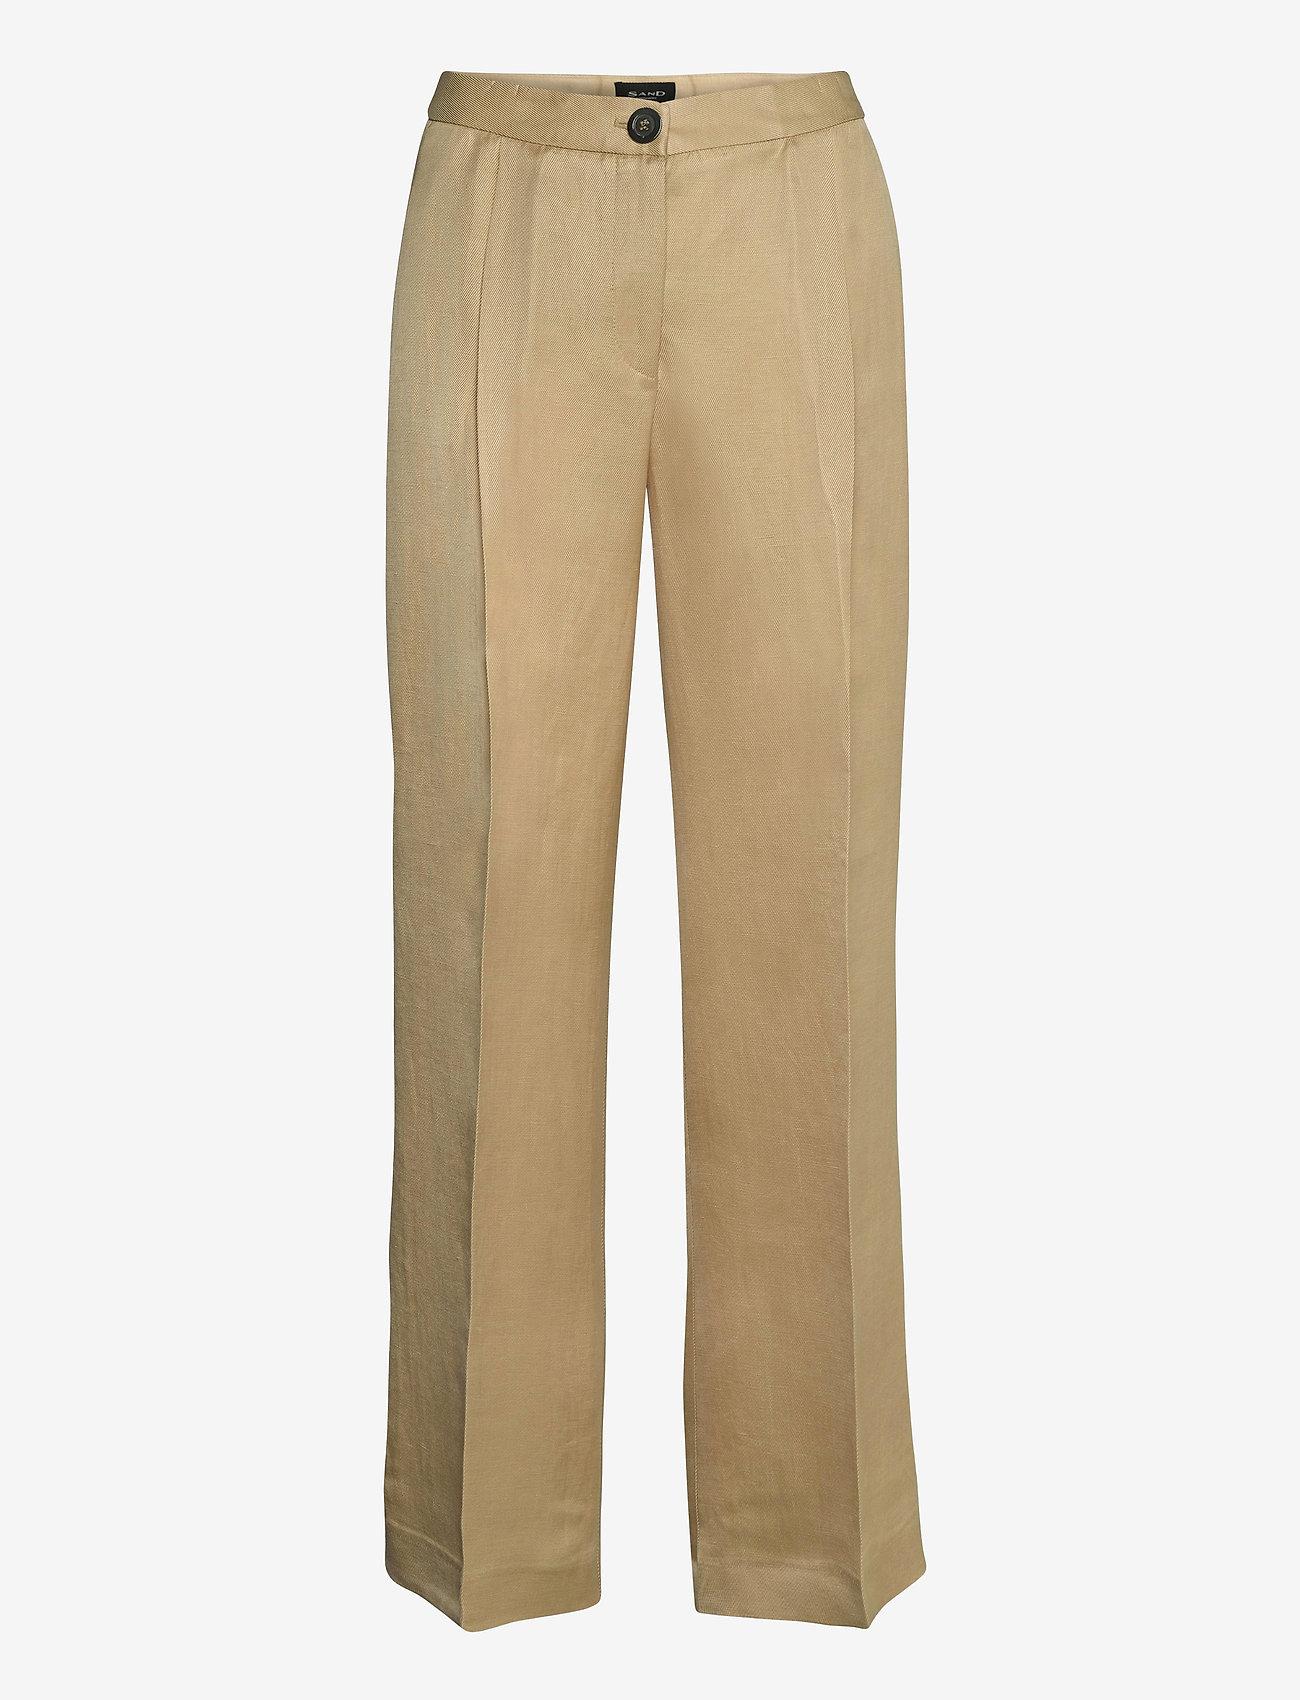 SAND - Twill Lux - Miriam - broeken med straight ben - light camel - 0